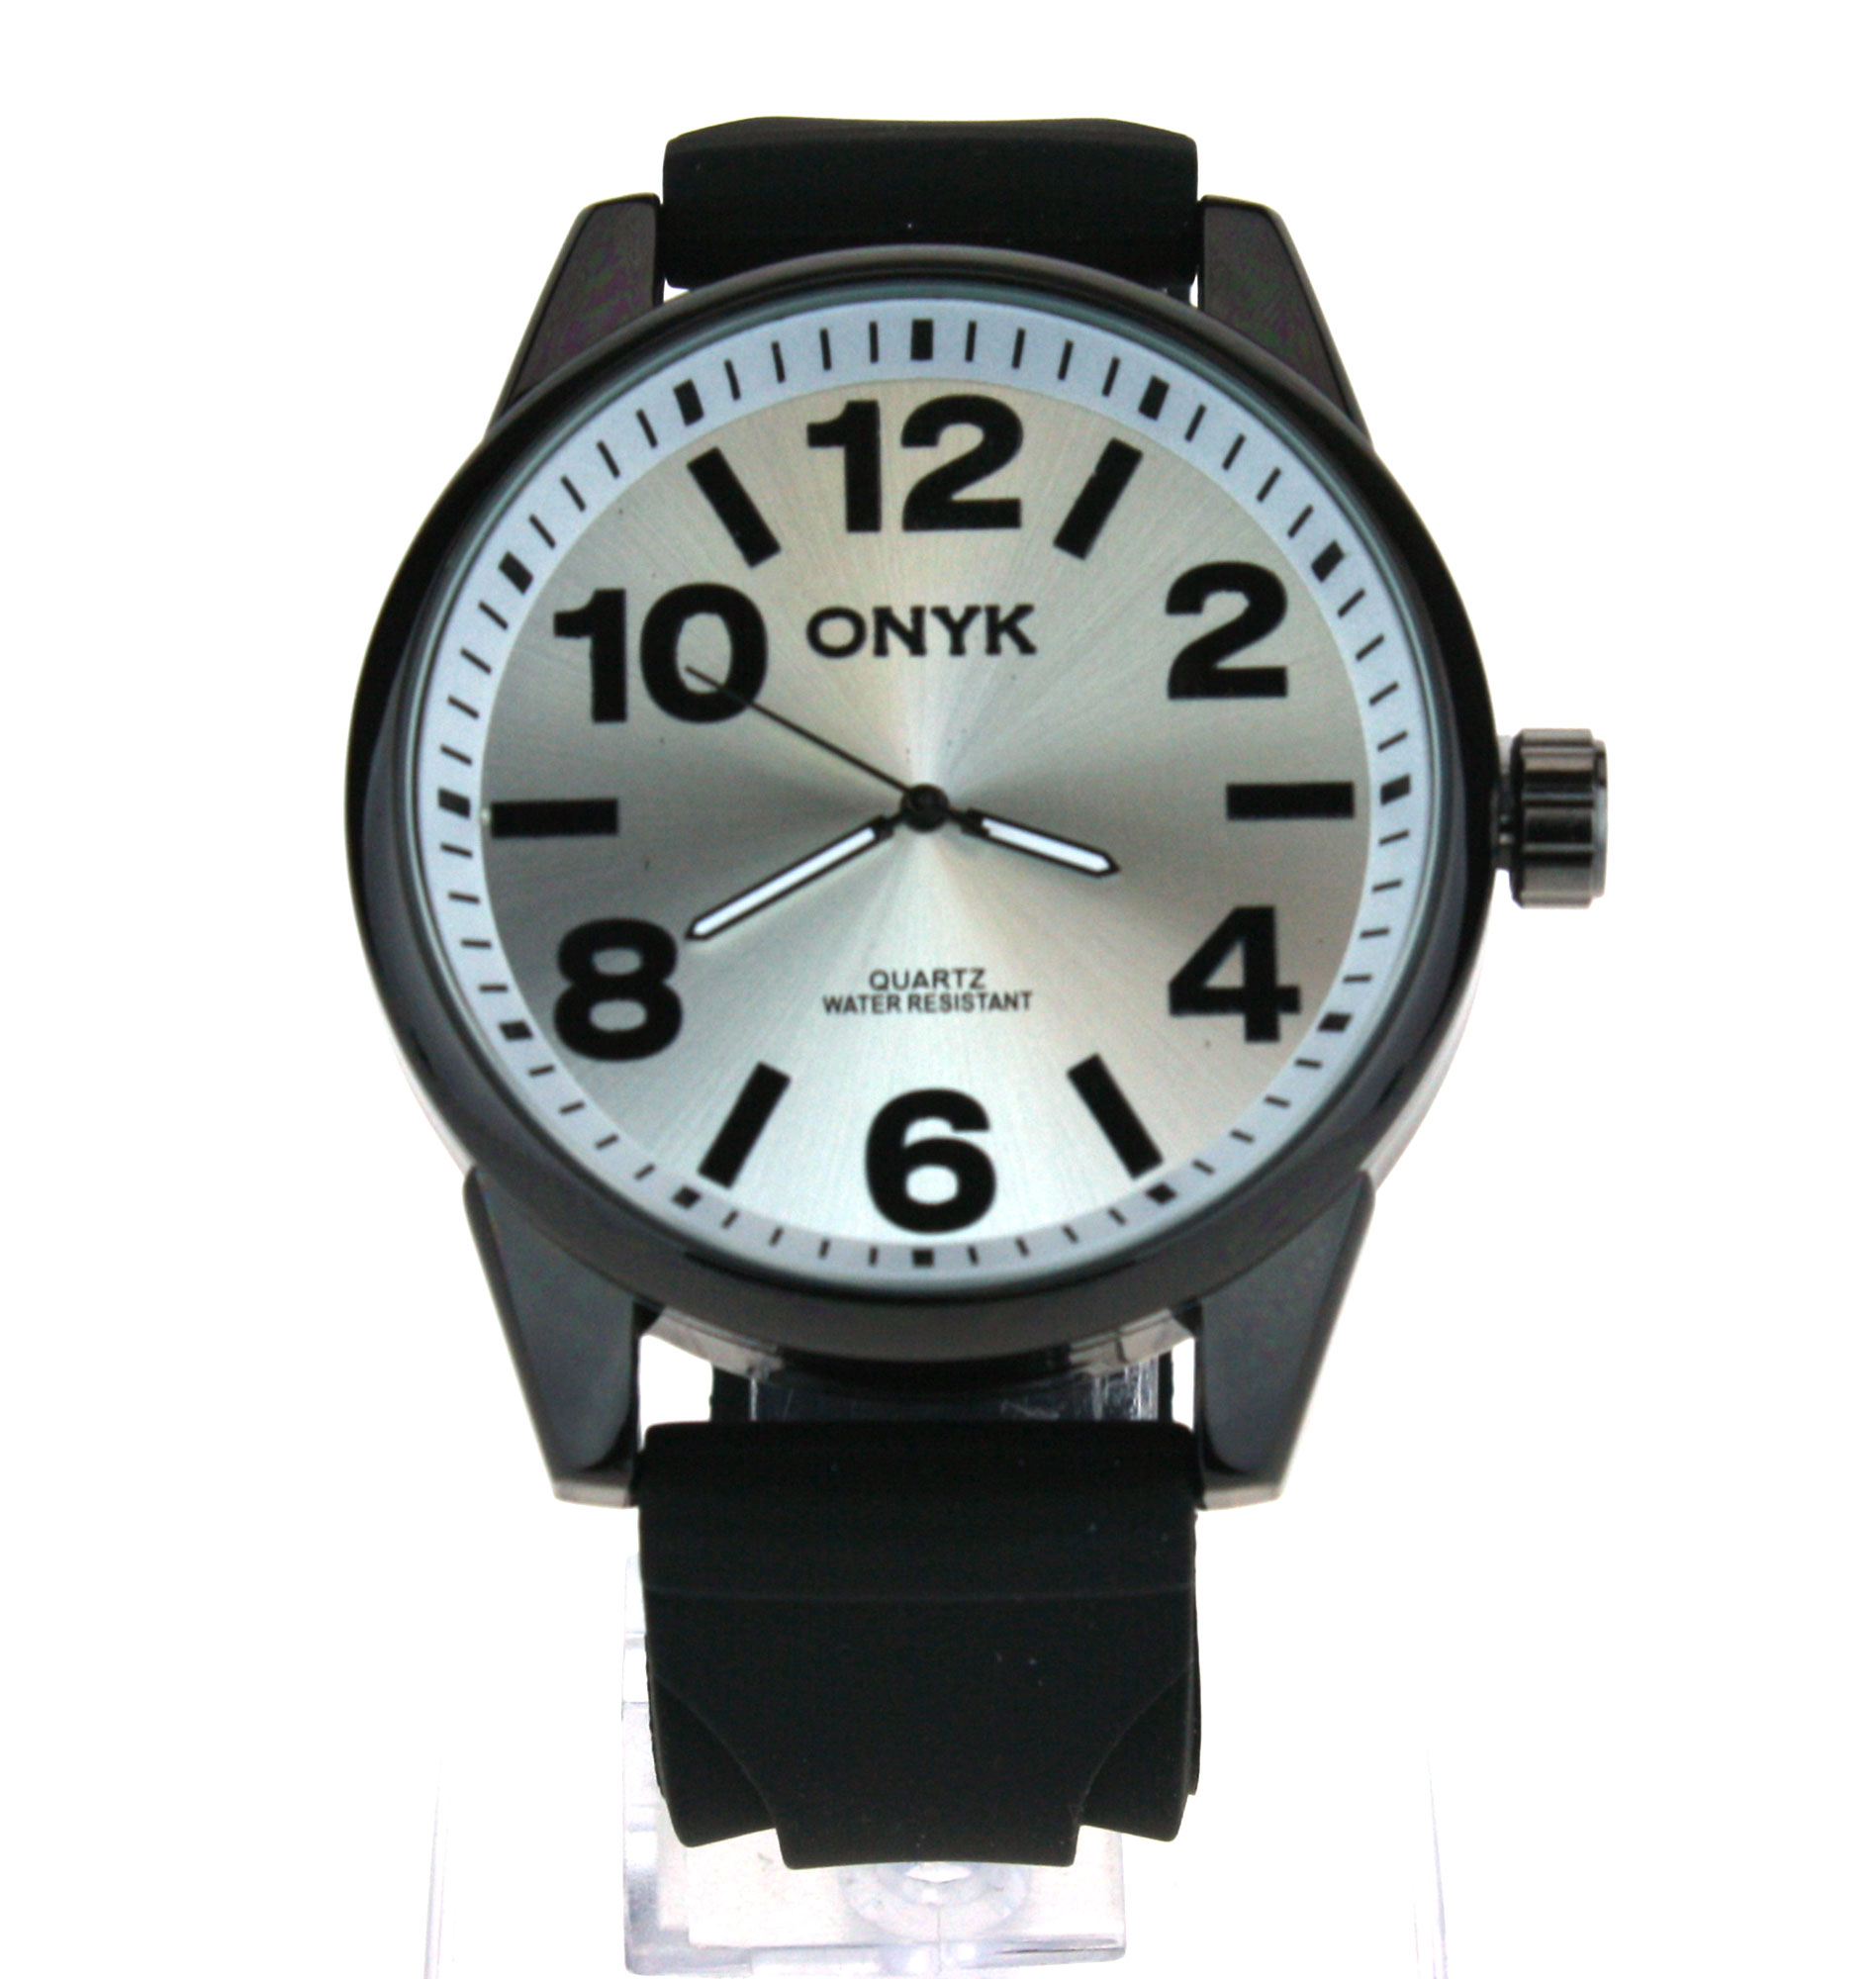 Sa106 on walmart marketplace marketplace pulse for Minimal art wrist watch